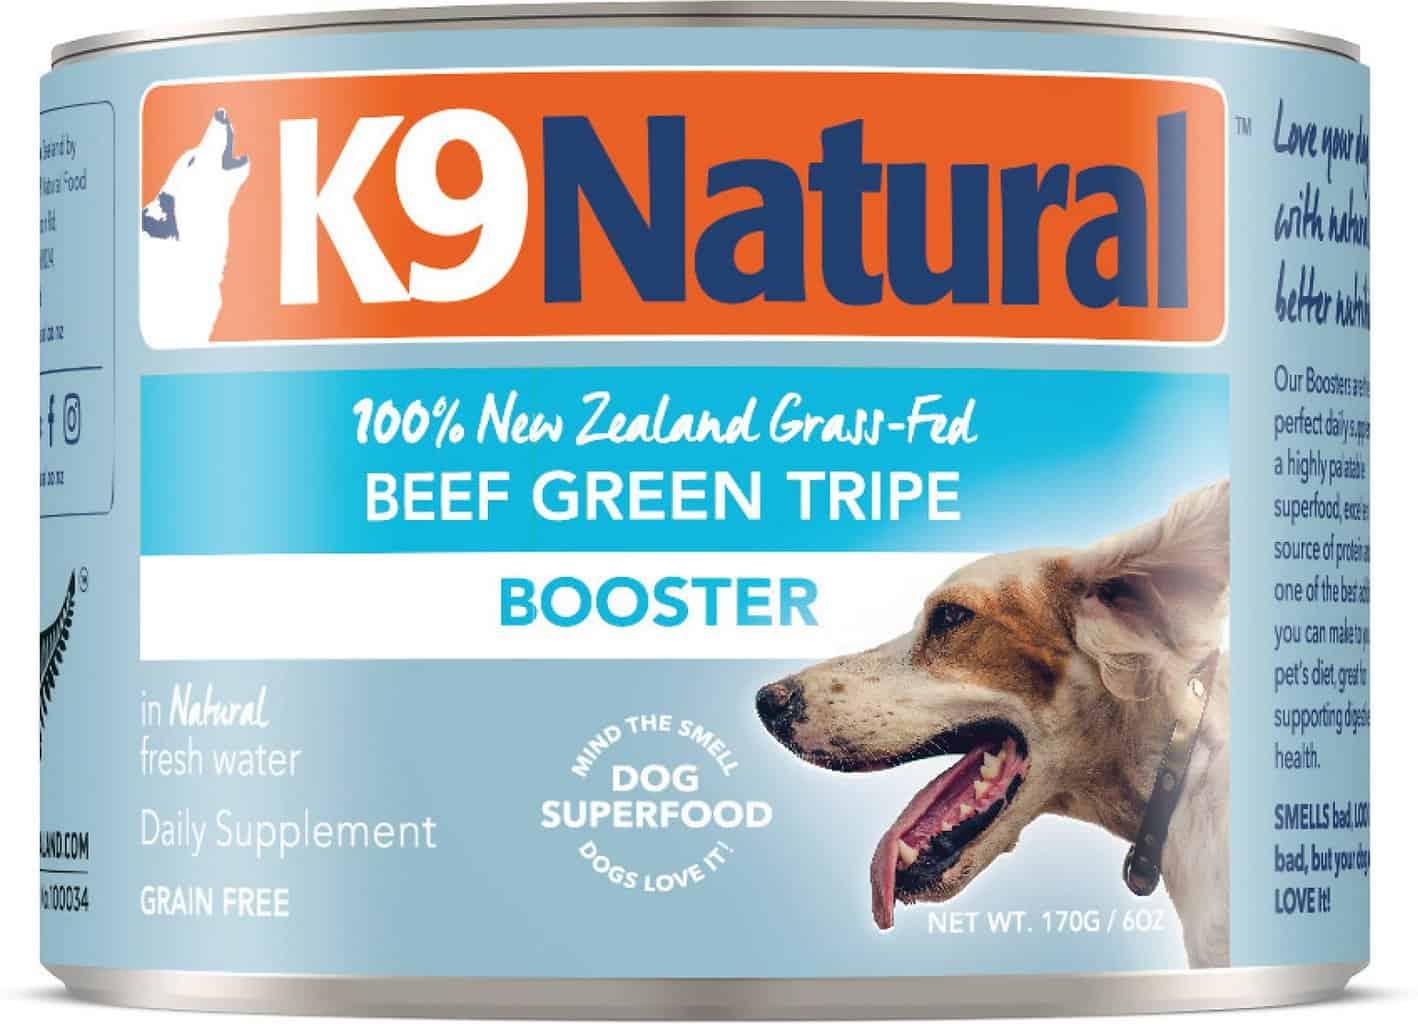 K9 Natural Dog Food Review 2021: Best Natural Pet Food? 20